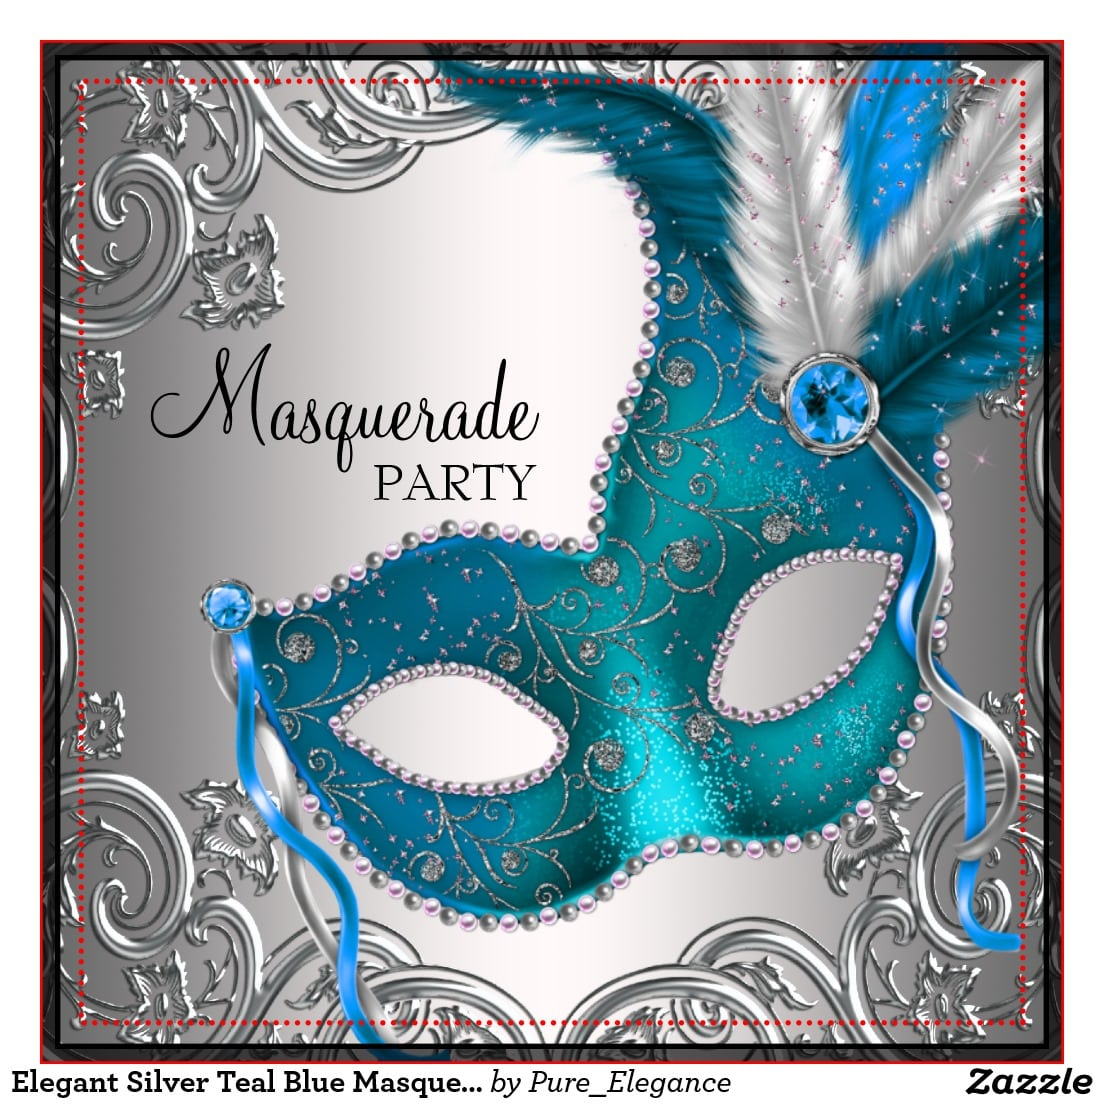 Masquerade Party Invitations